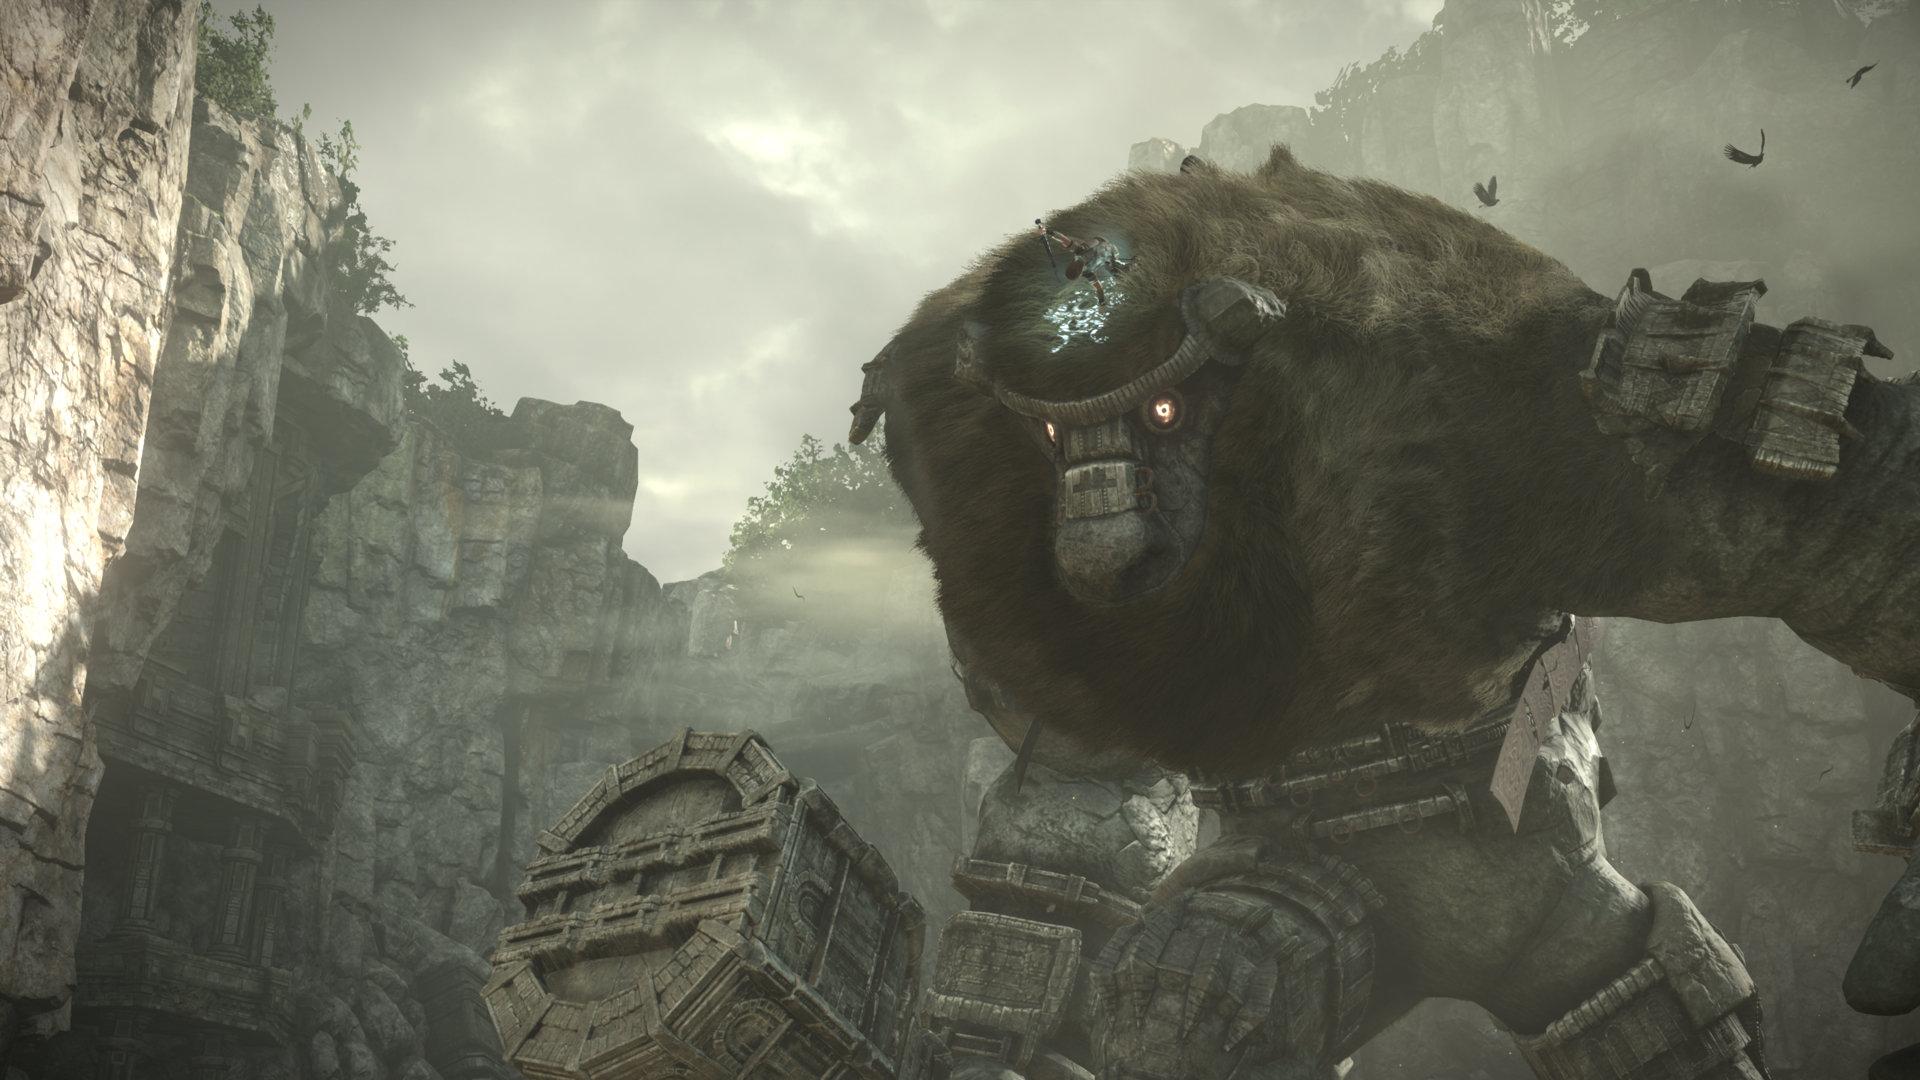 Опубликованы 4K-скриншоты Shadow of the Colossus с PS4 Pro